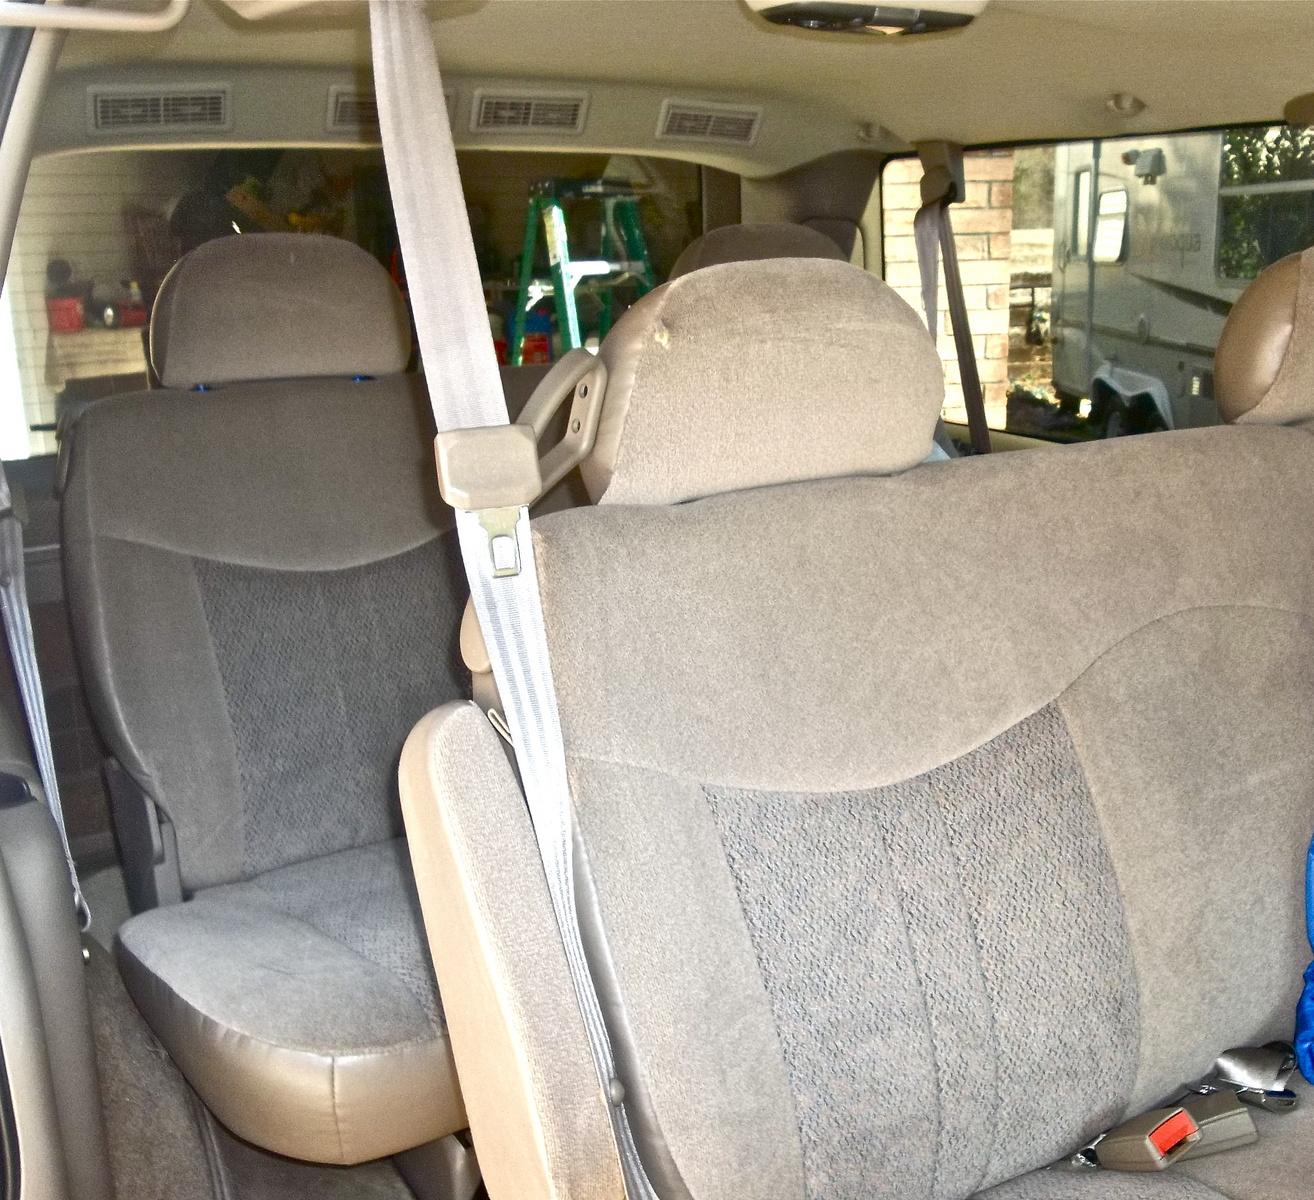 1992 Gmc Safari Cargo Interior: 2002 Chevrolet Astro